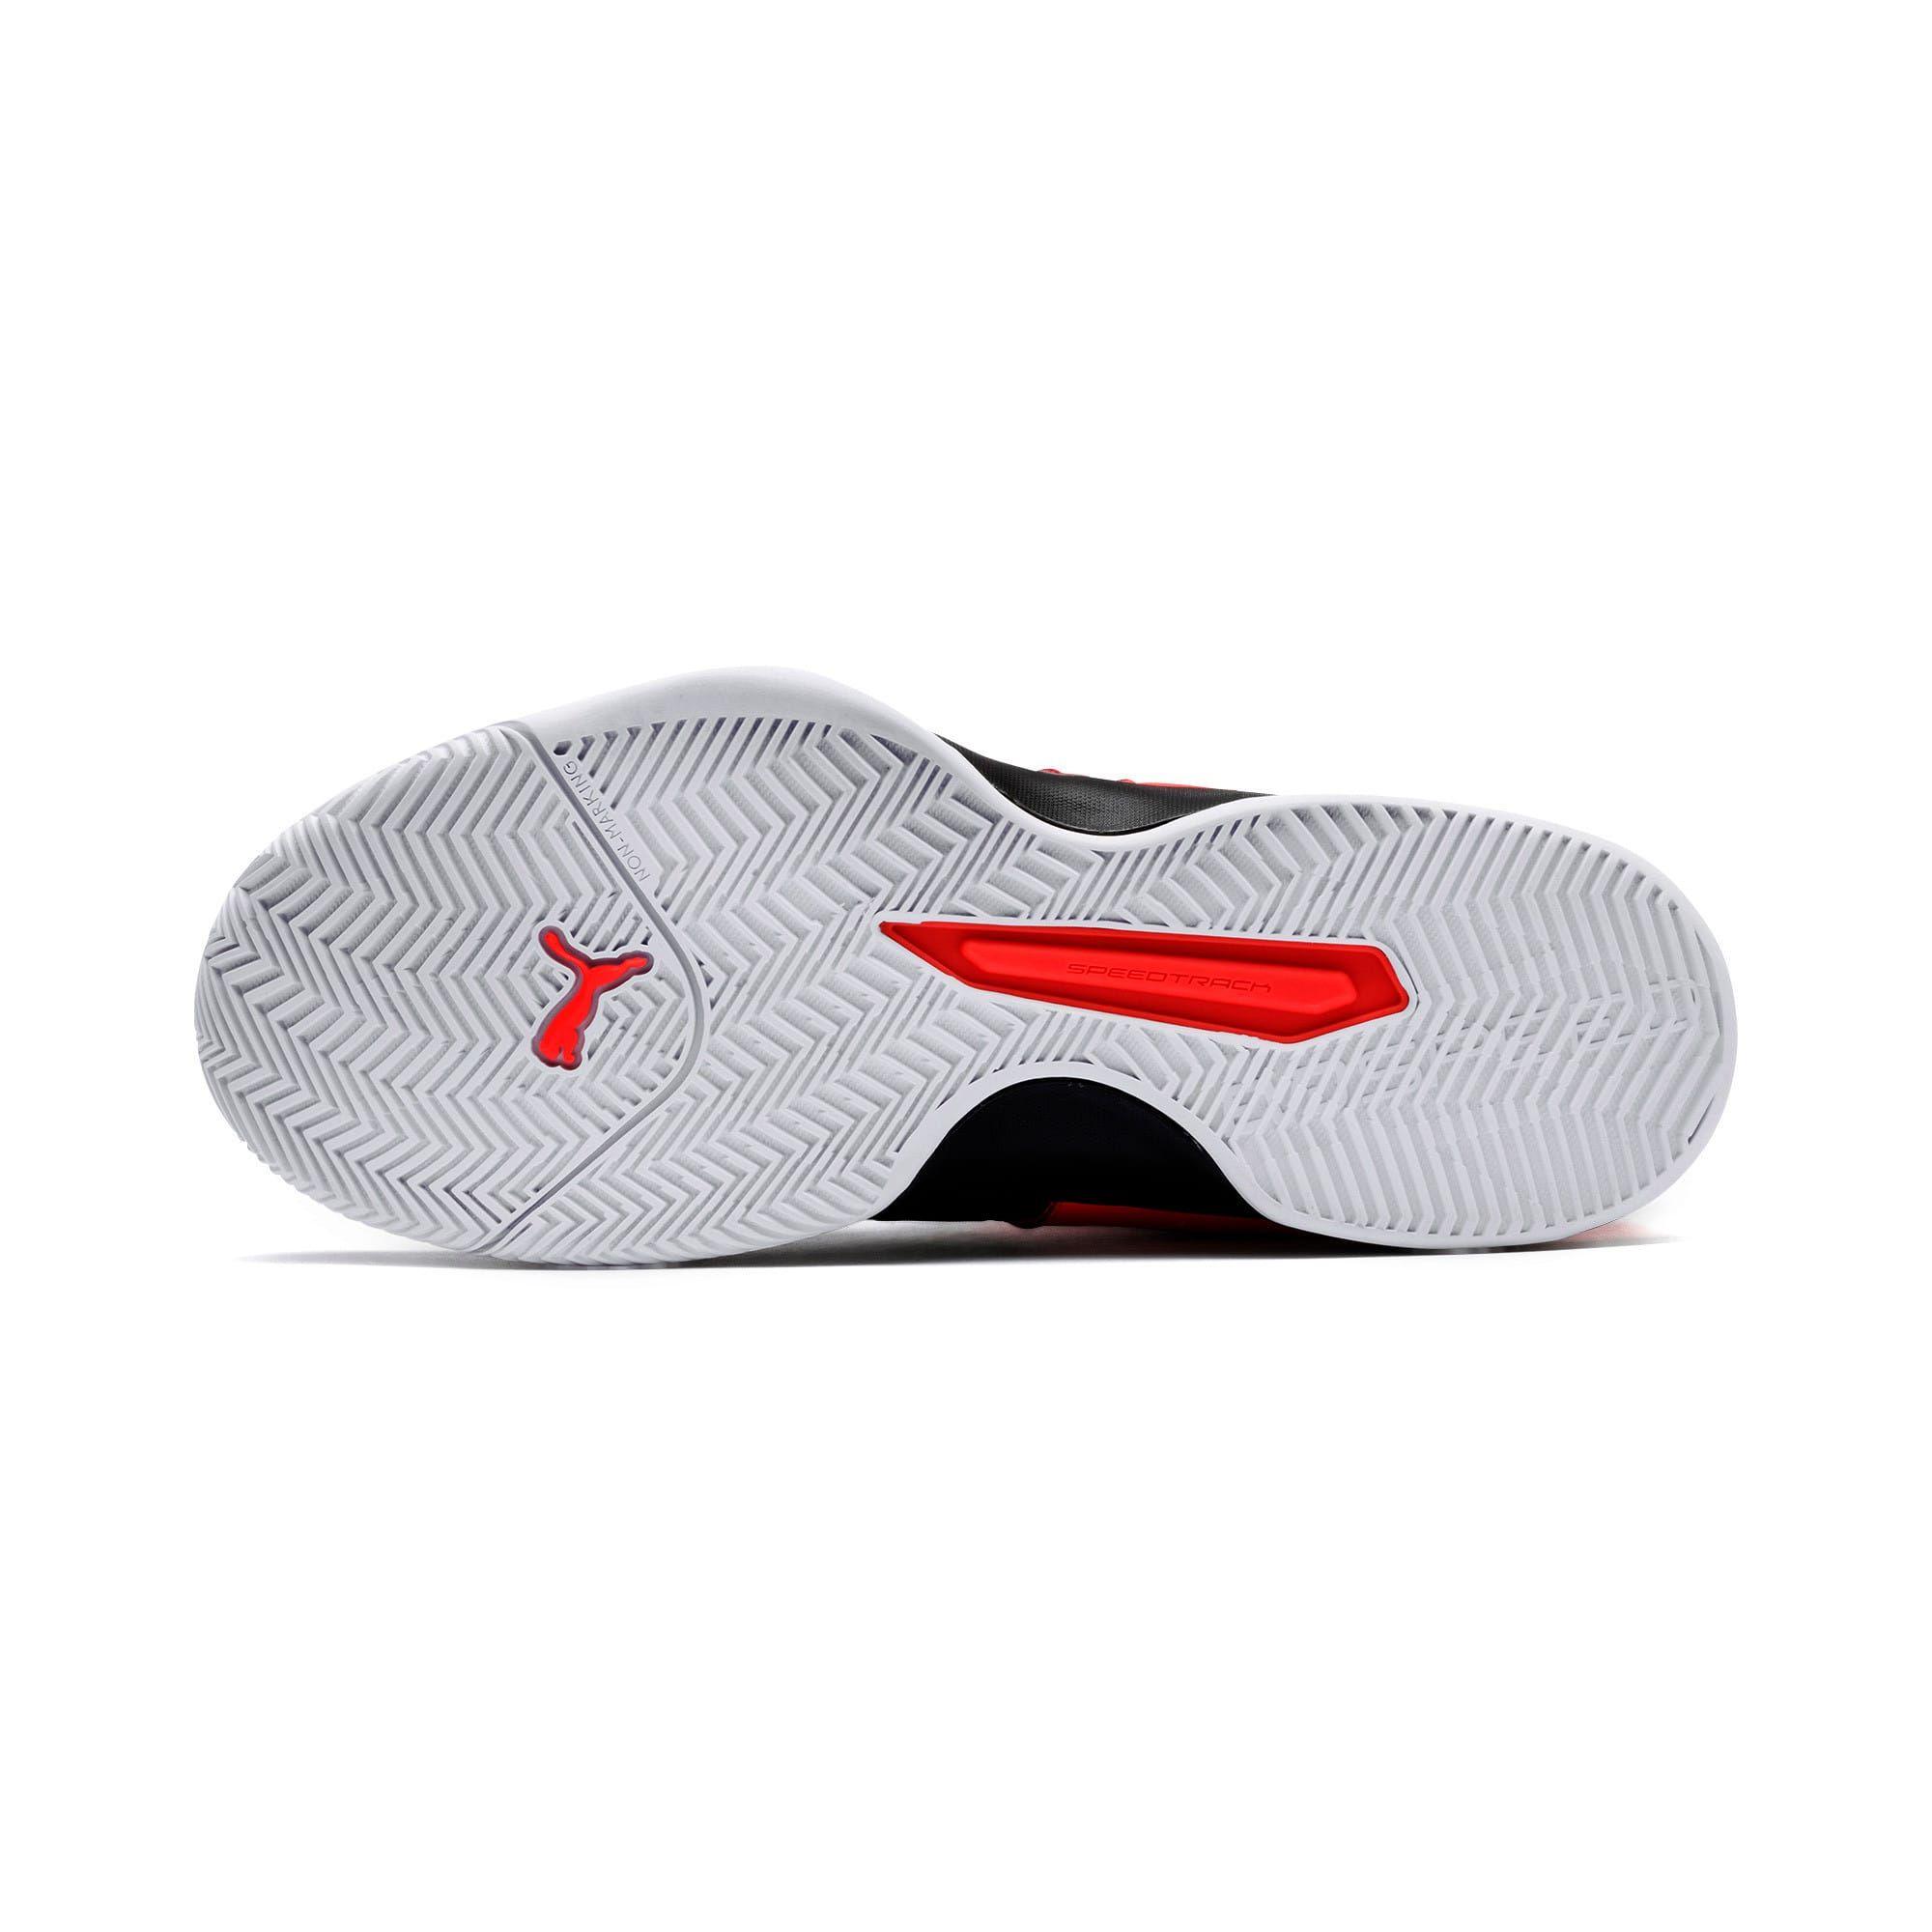 chaussures de handball pour homme puma